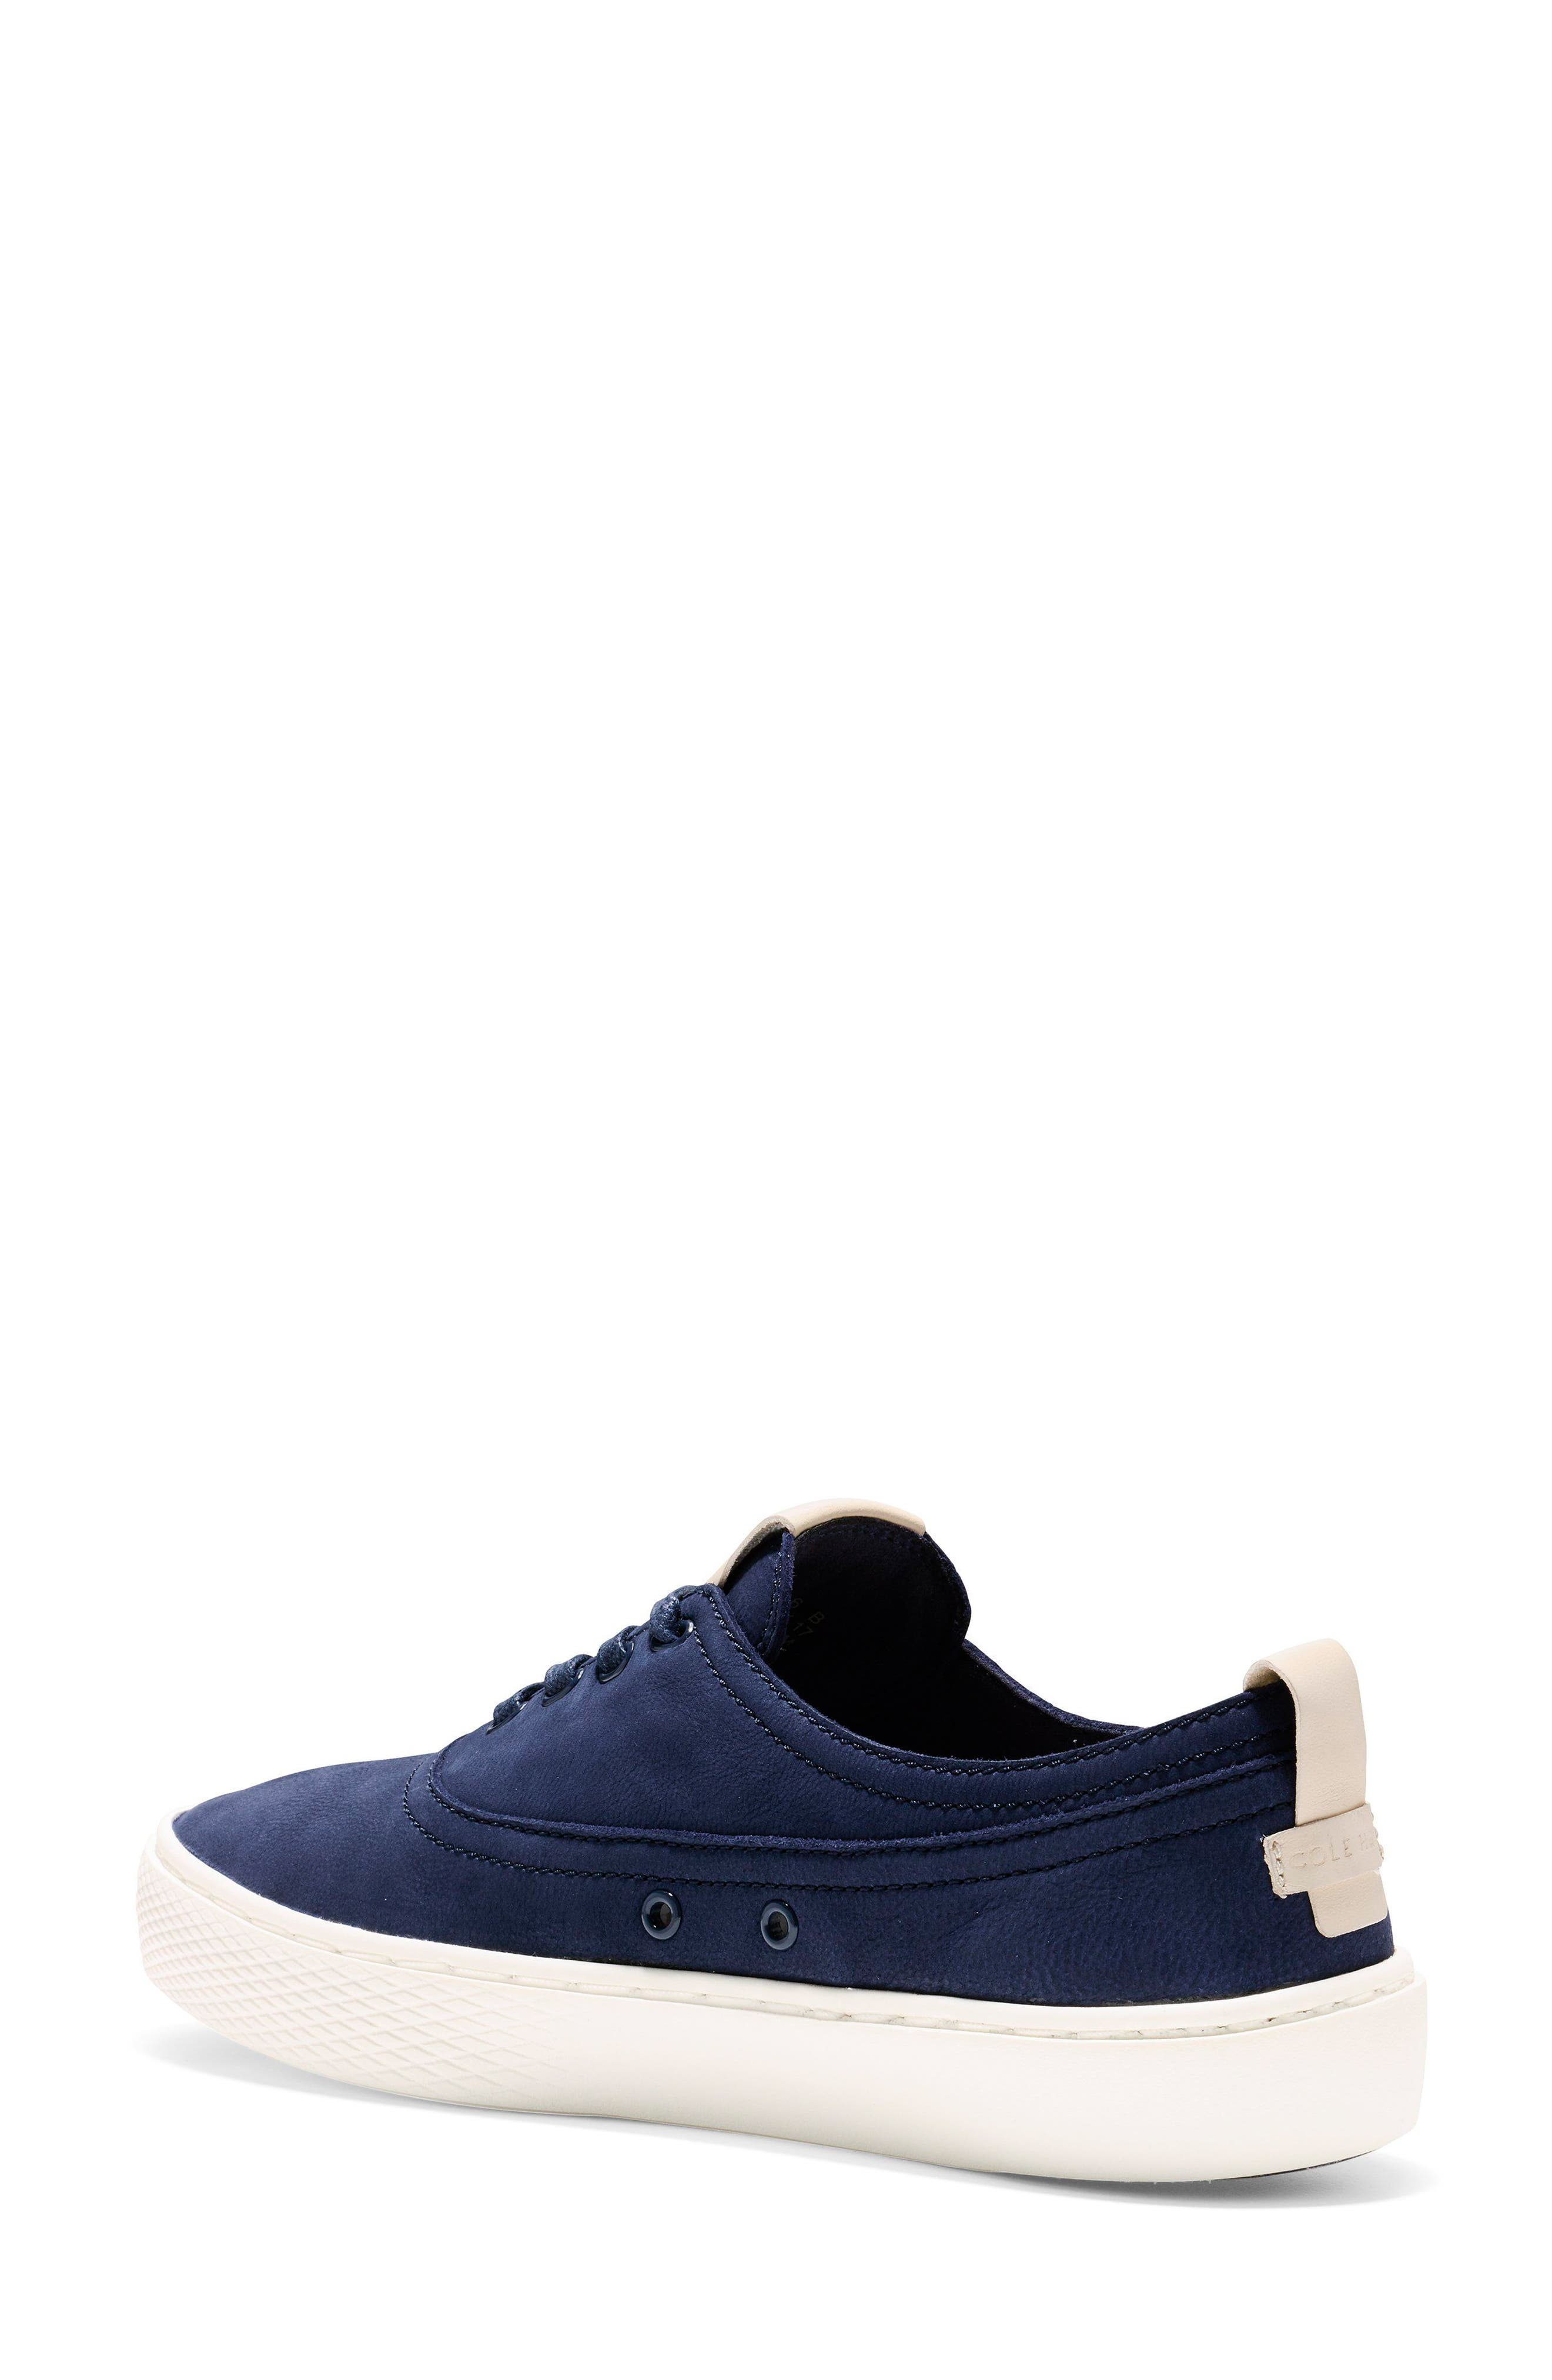 GrandPro Deck Sneaker,                             Alternate thumbnail 2, color,                             Blue/ White Nubuck